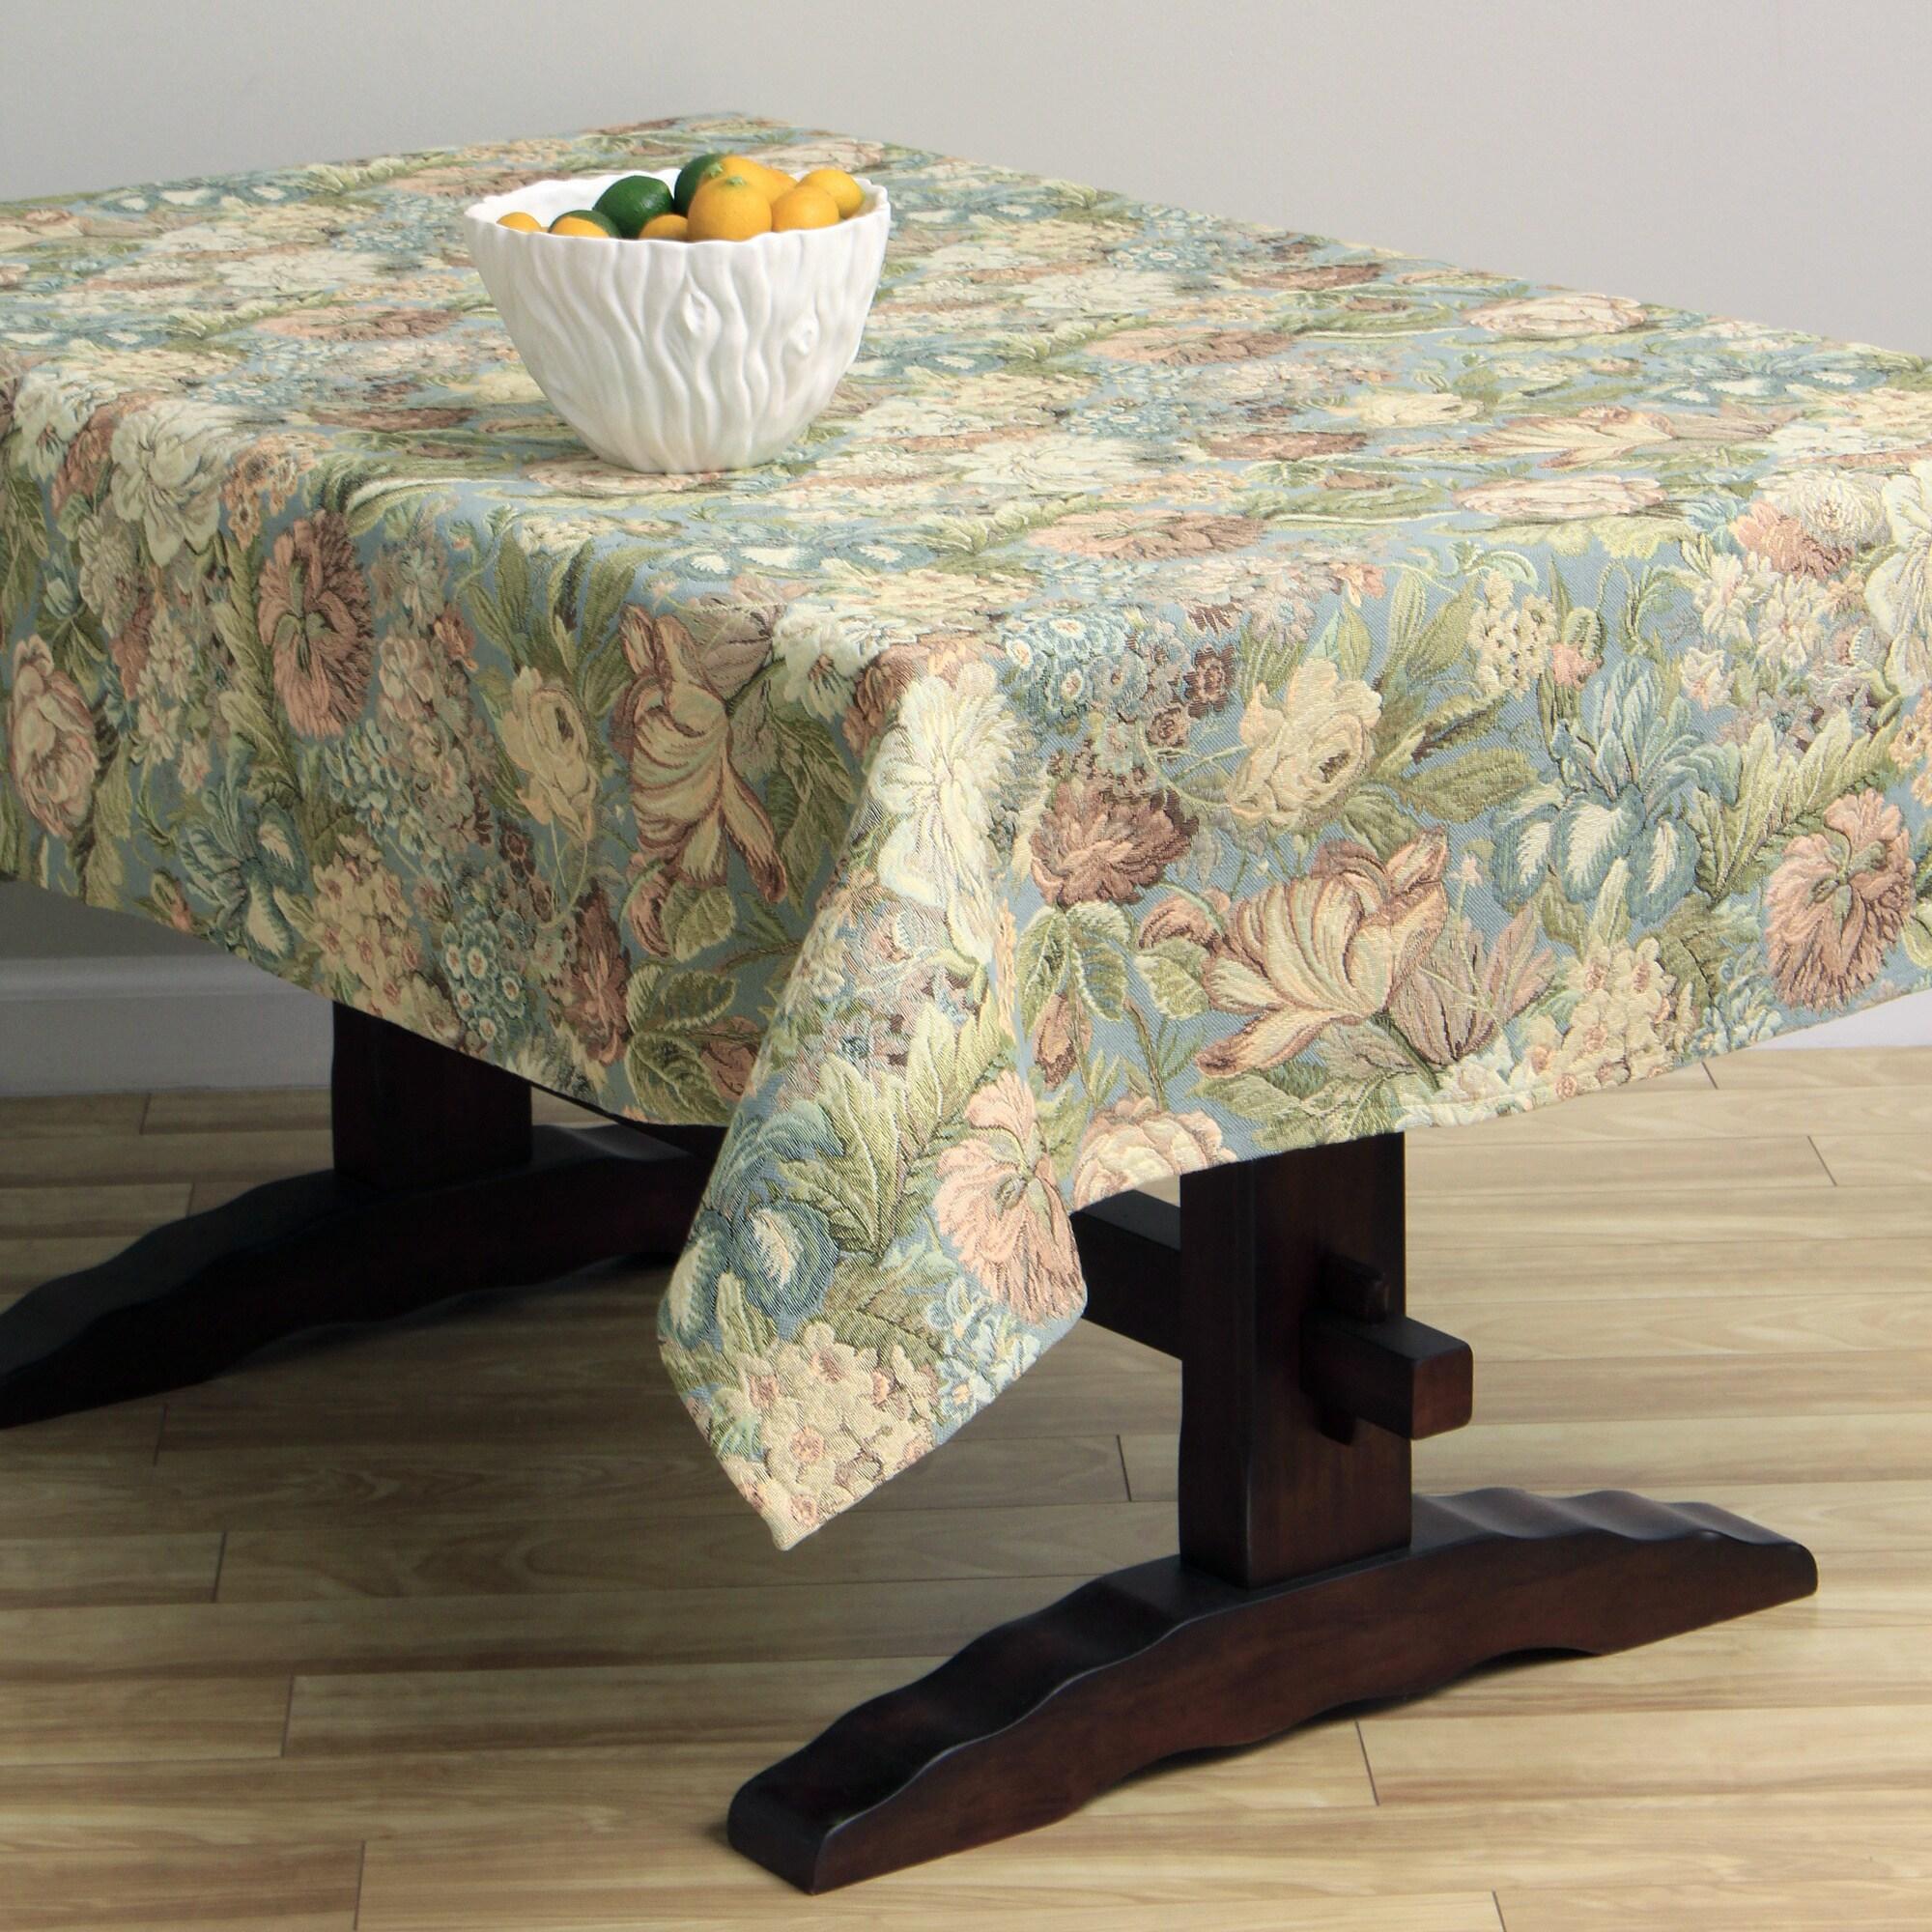 Overstock.com Corona Decor Floral Design 50x90-inch Italian Heavyweight Tablecloth at Sears.com